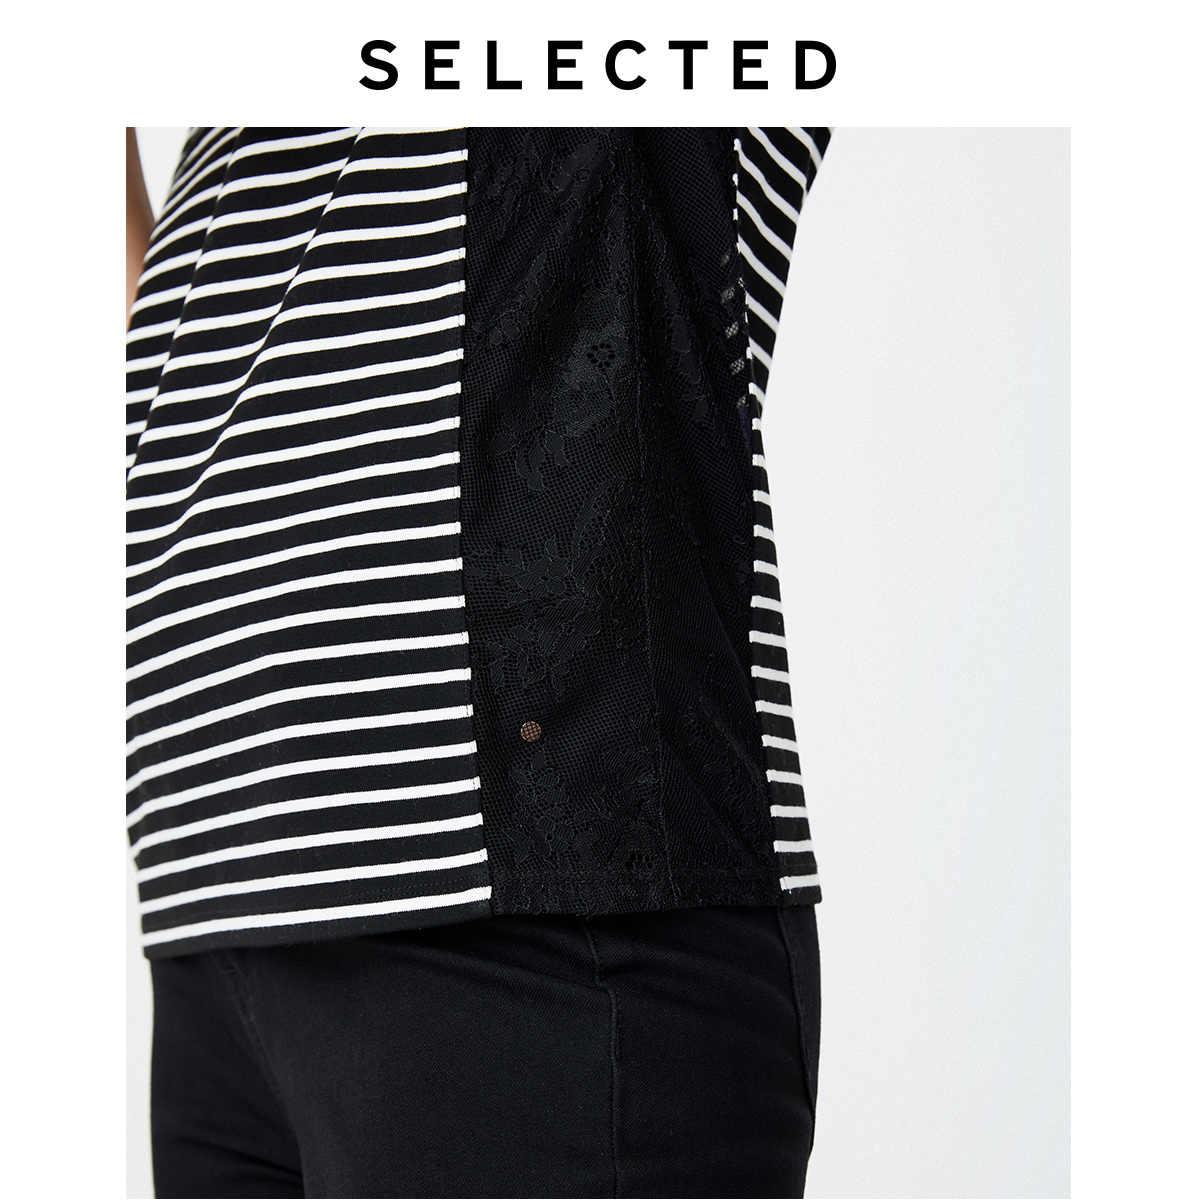 SELECTED 여성용 스트레치 스트 라이프 레이스 컷 아웃 t 셔츠 S | 419301503